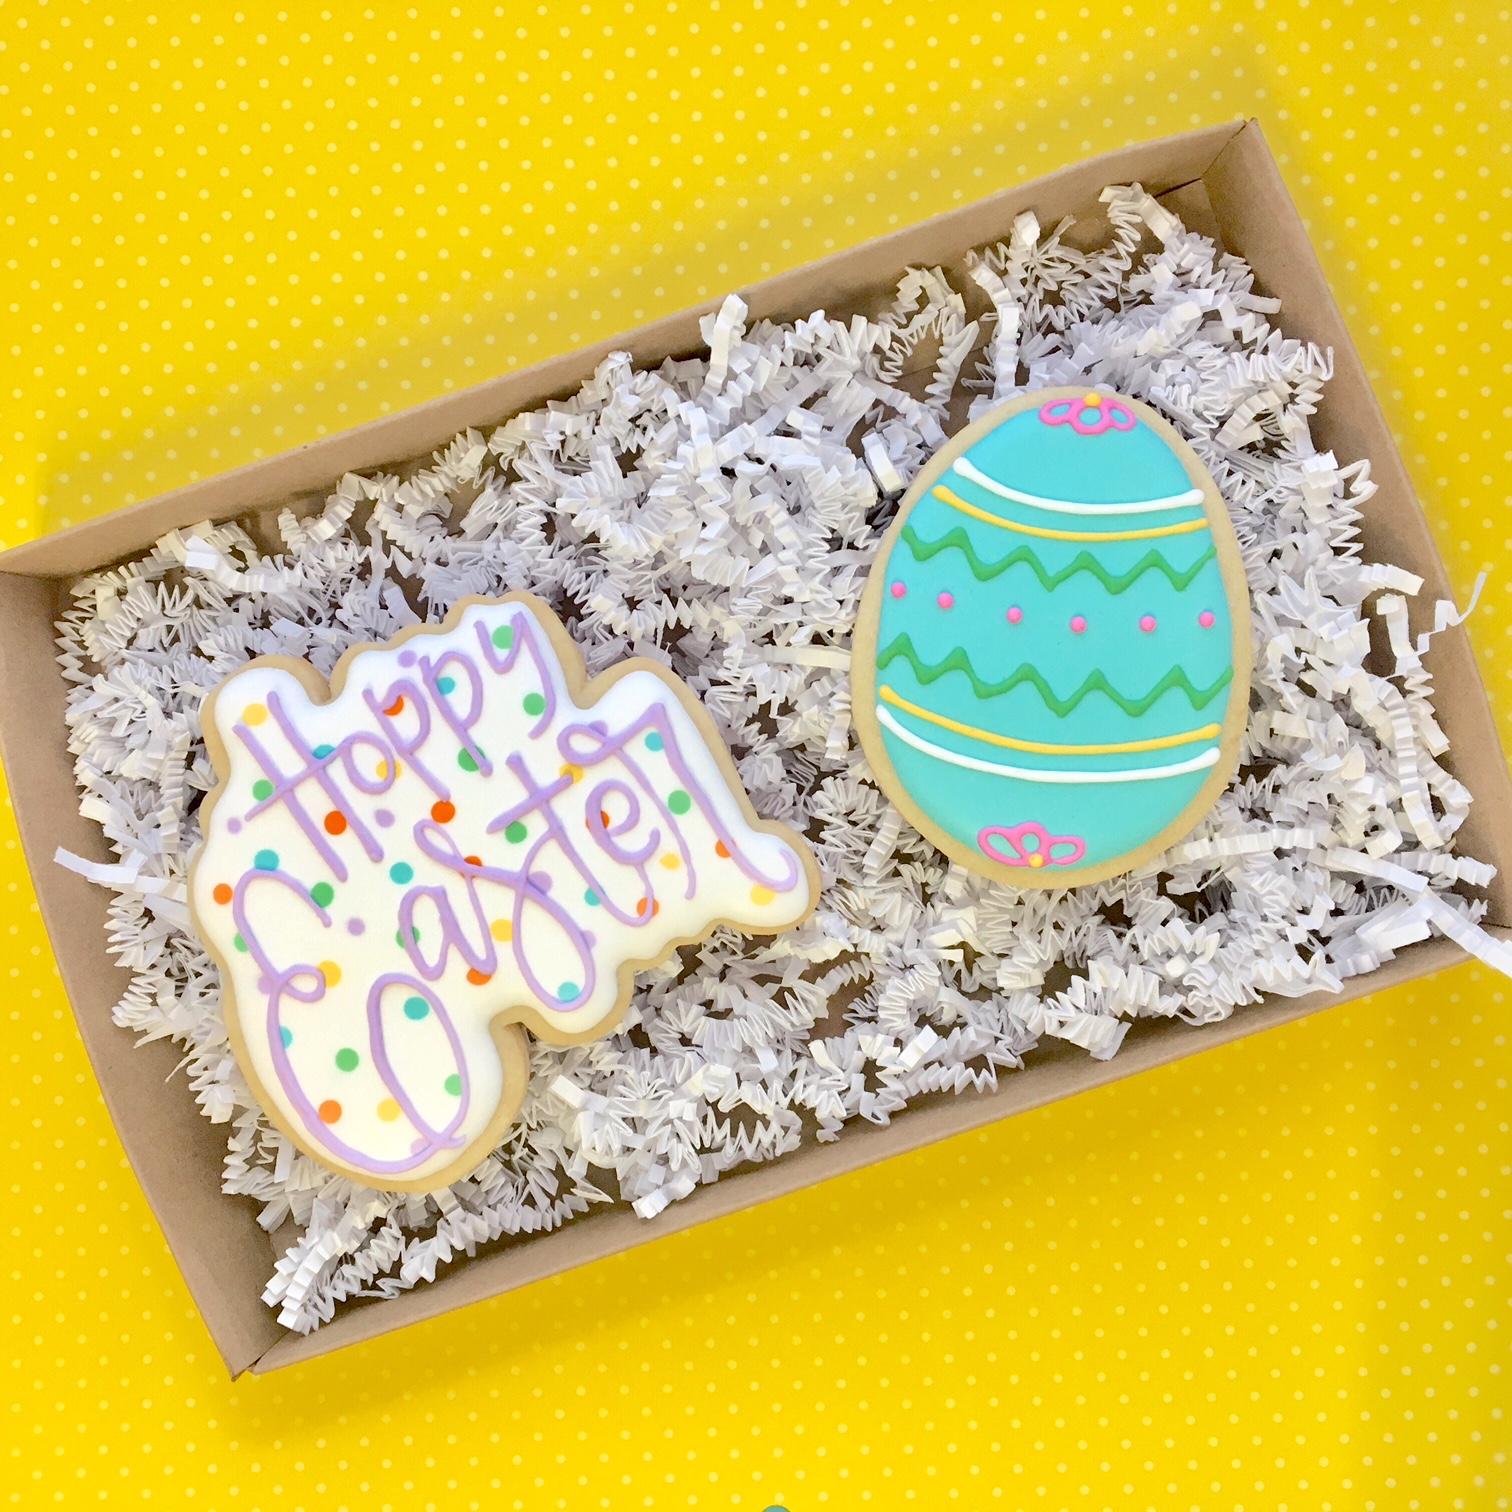 Easter Sugar Cookies 2-pack Gift Box